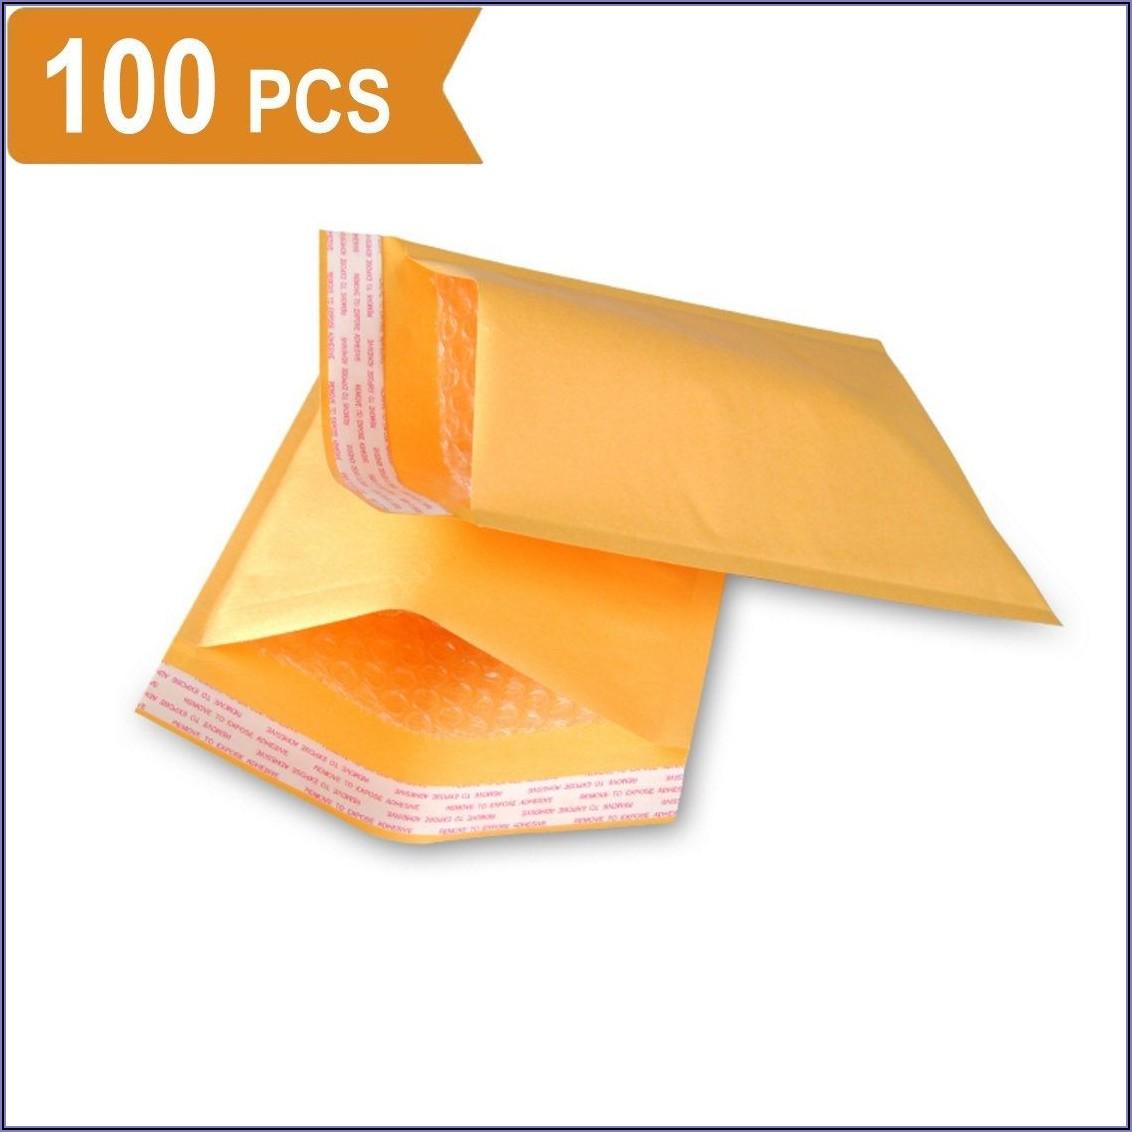 Postage For 5x7 Padded Envelope